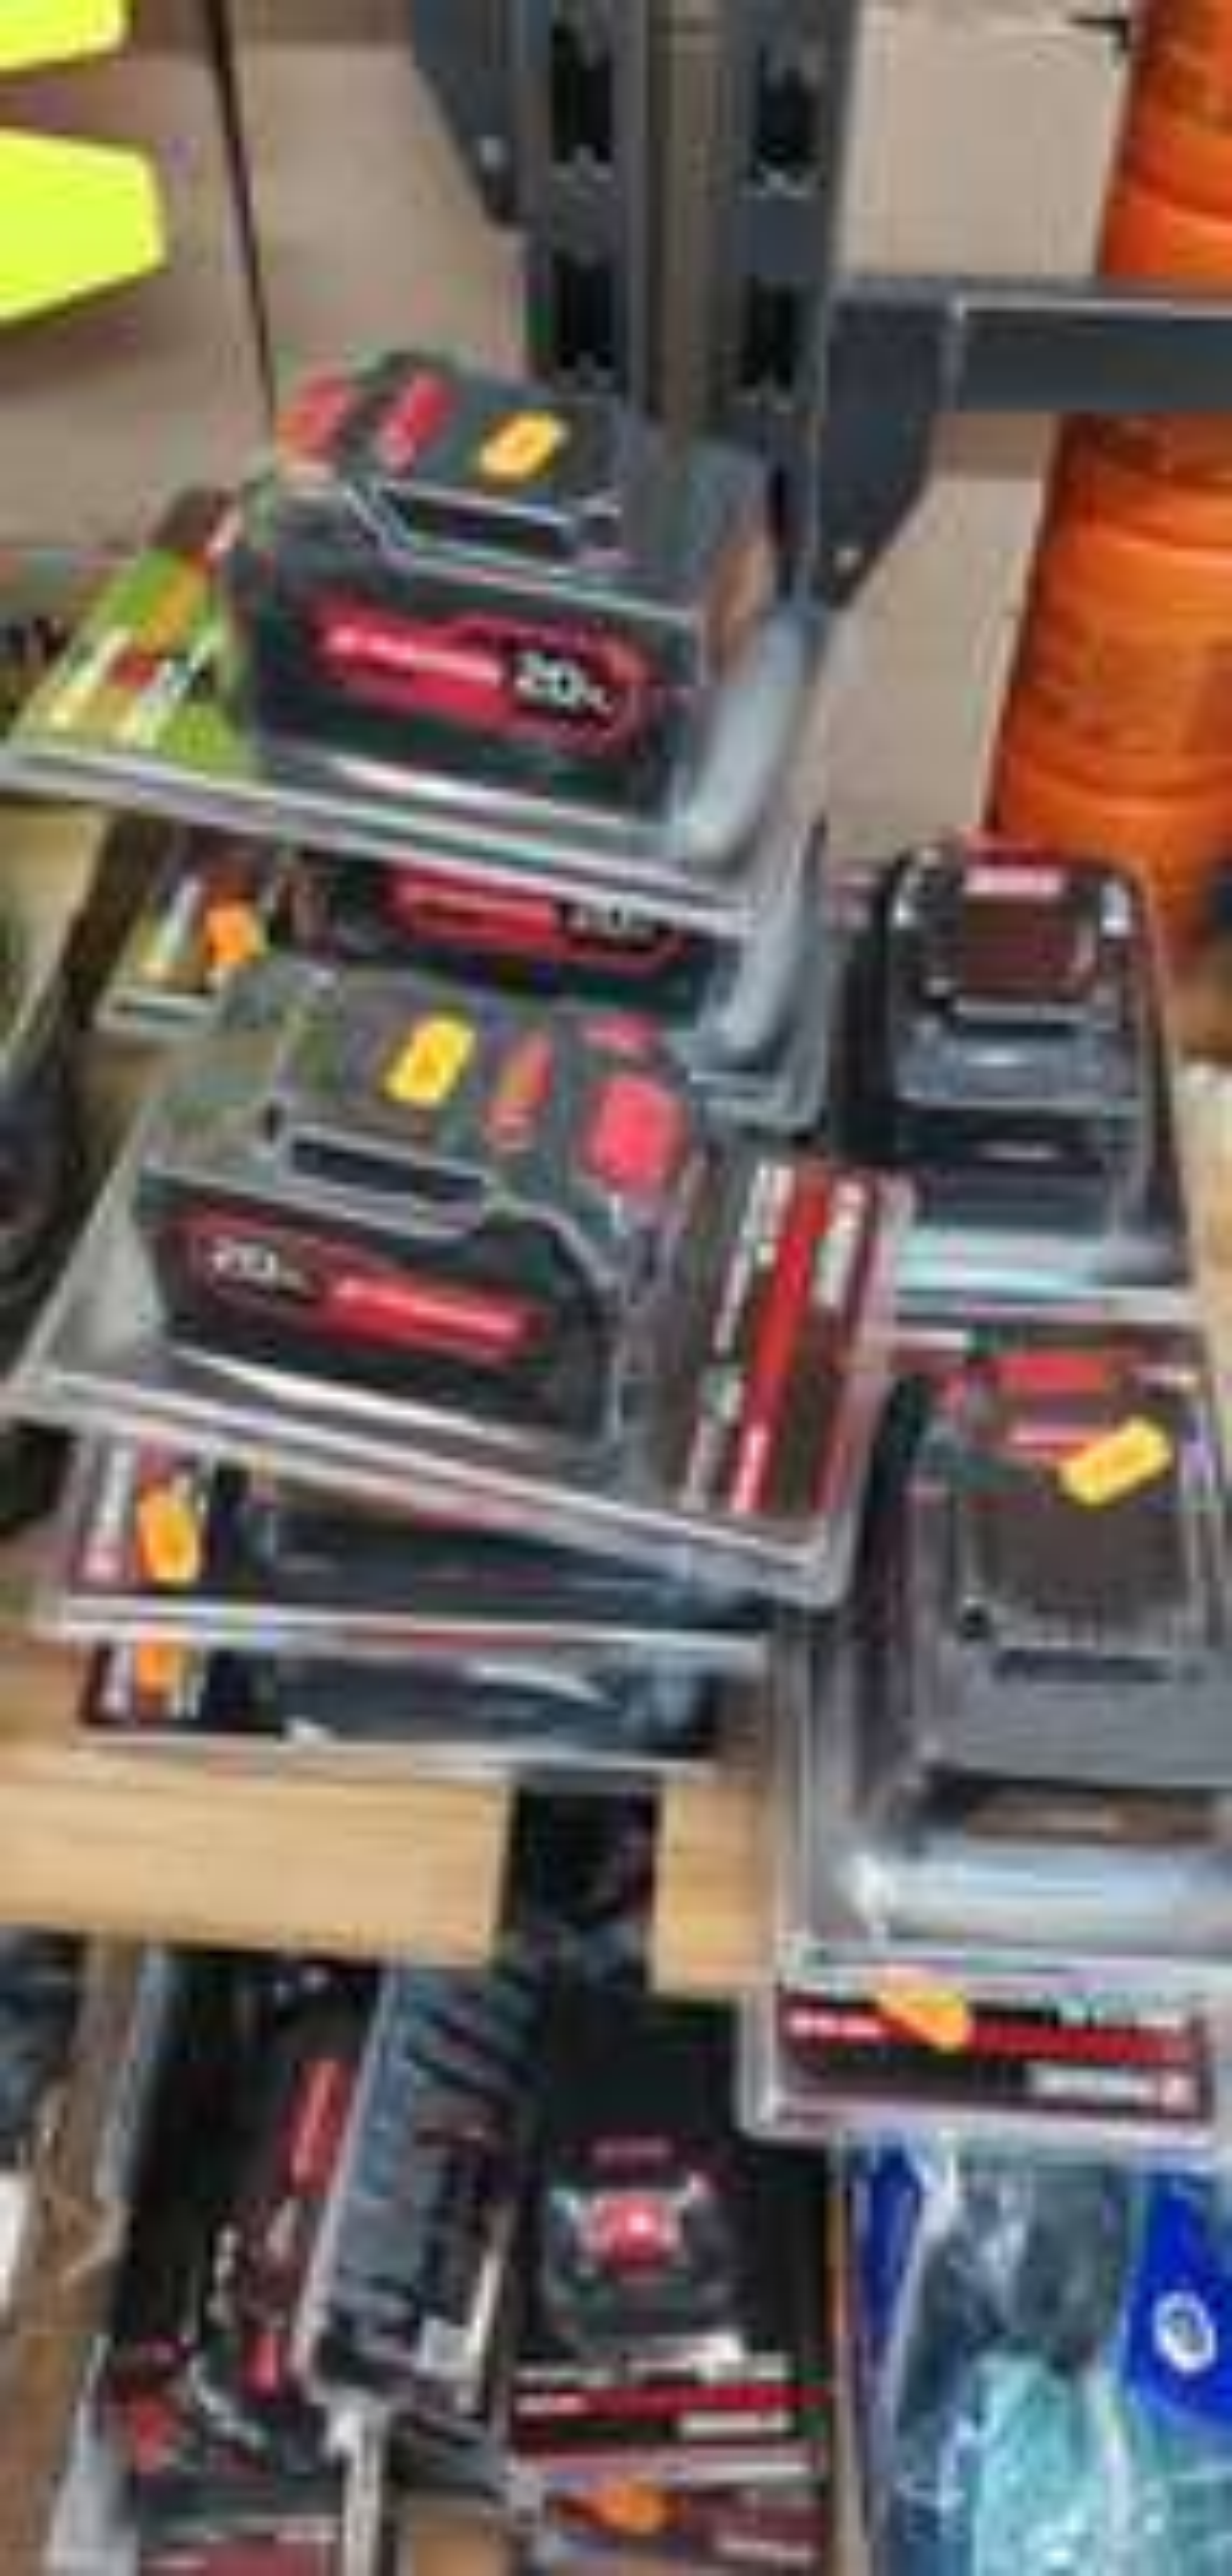 Batterie Parkside 20v 5Ah - Stock Privé Crépy-en-Valois (60)